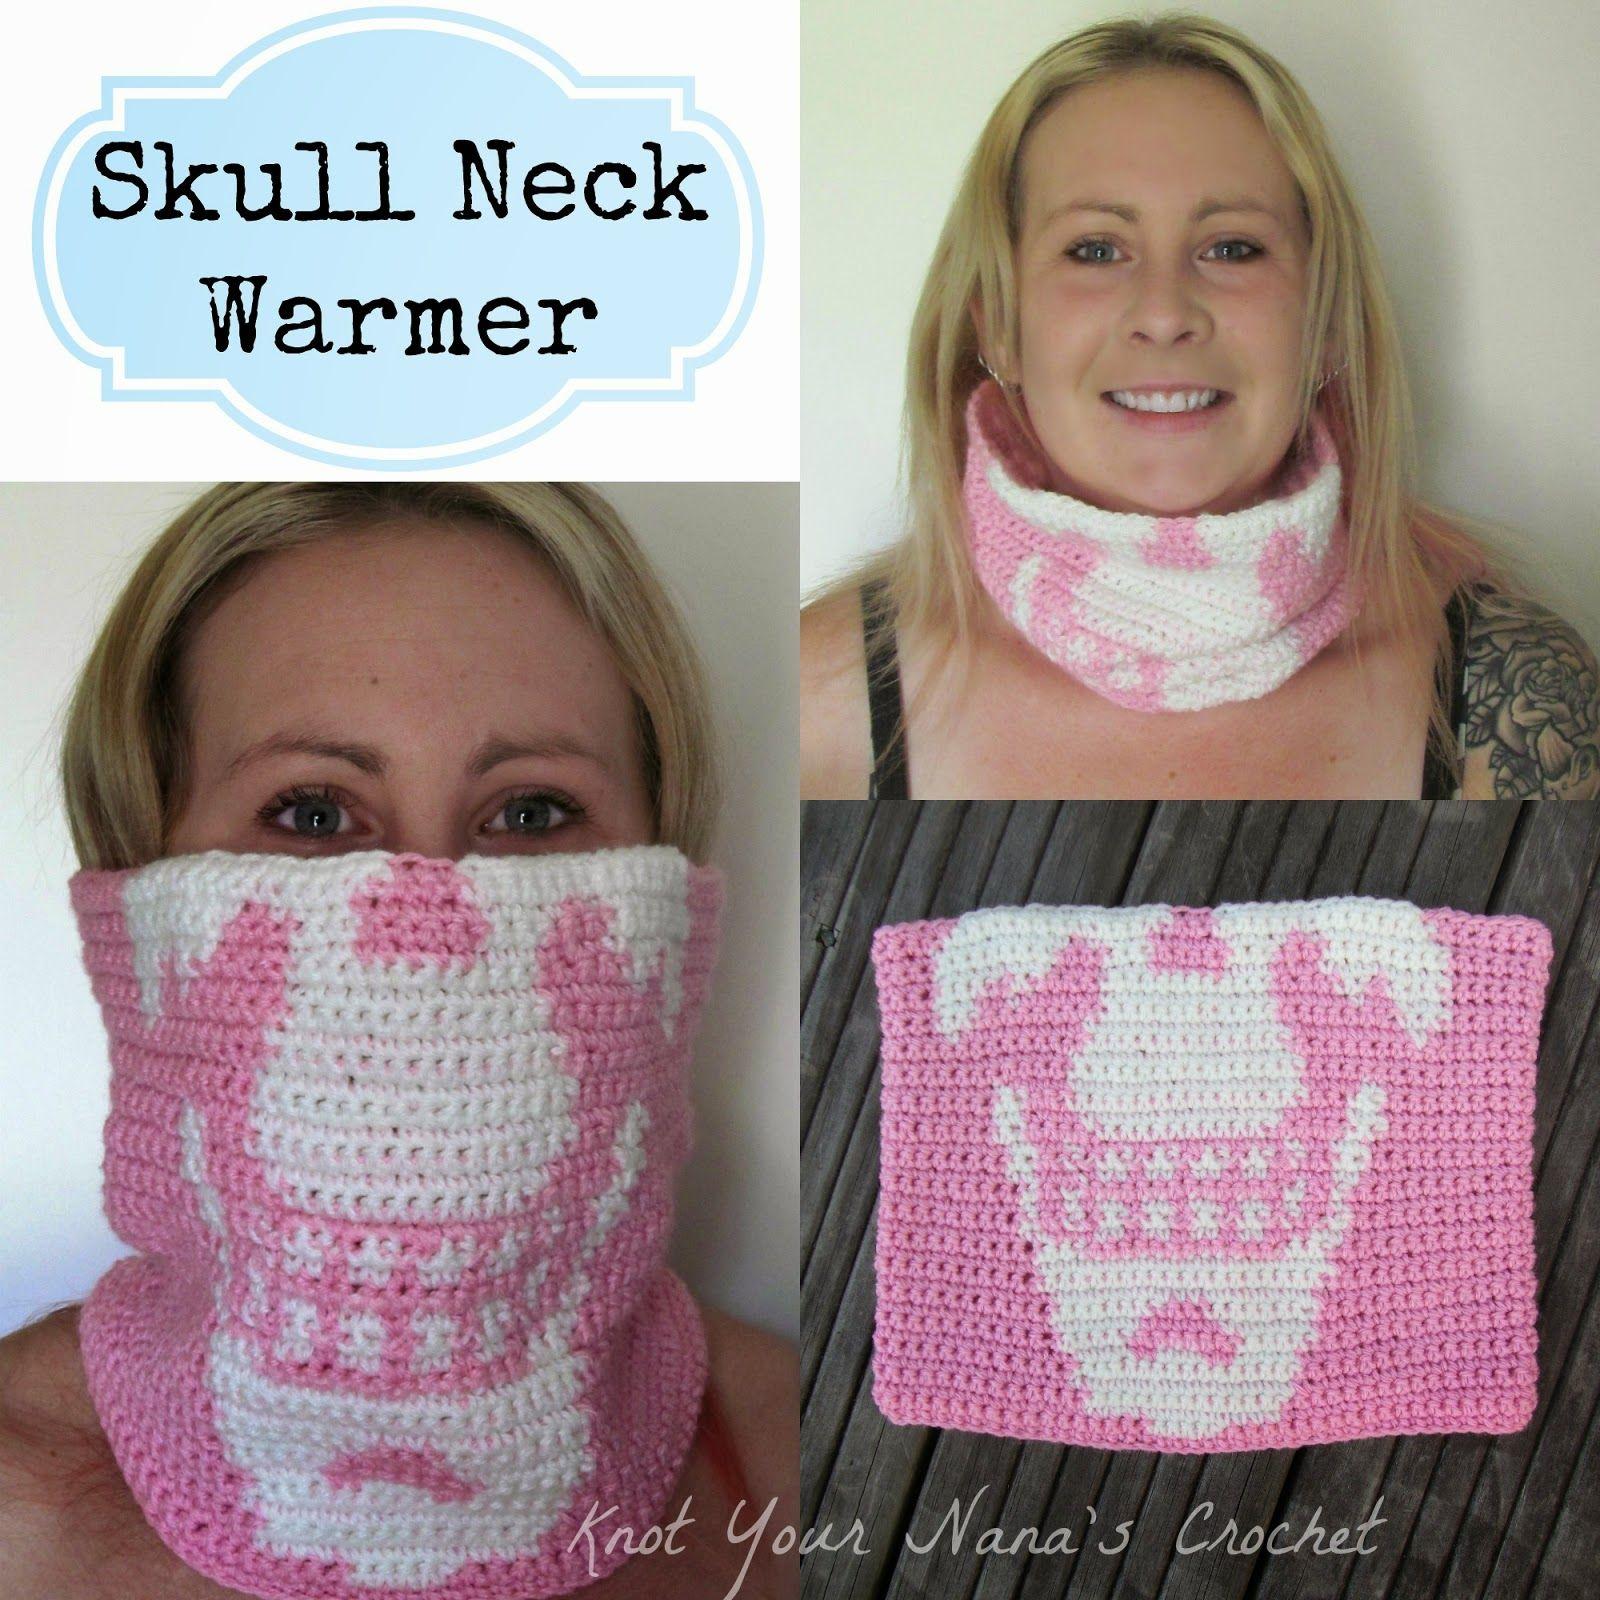 Knot your nanas crochet crochet skull neck warmer crochet y knot your nanas crochet crochet skull neck warmer bankloansurffo Choice Image